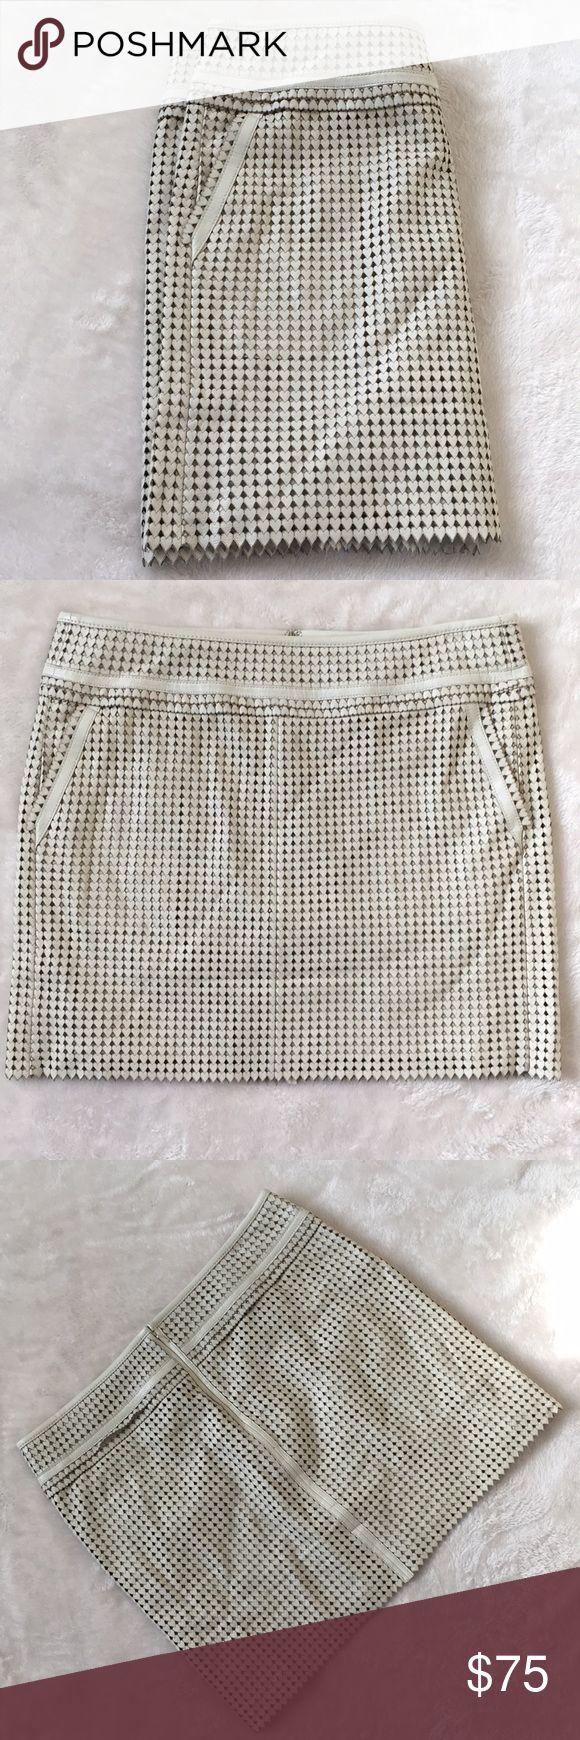 Tory Burch Cream Leather Hearts Skirt Tory Burch Cream Leather Hearts Skirt Size 10 Tory Burch Skirts